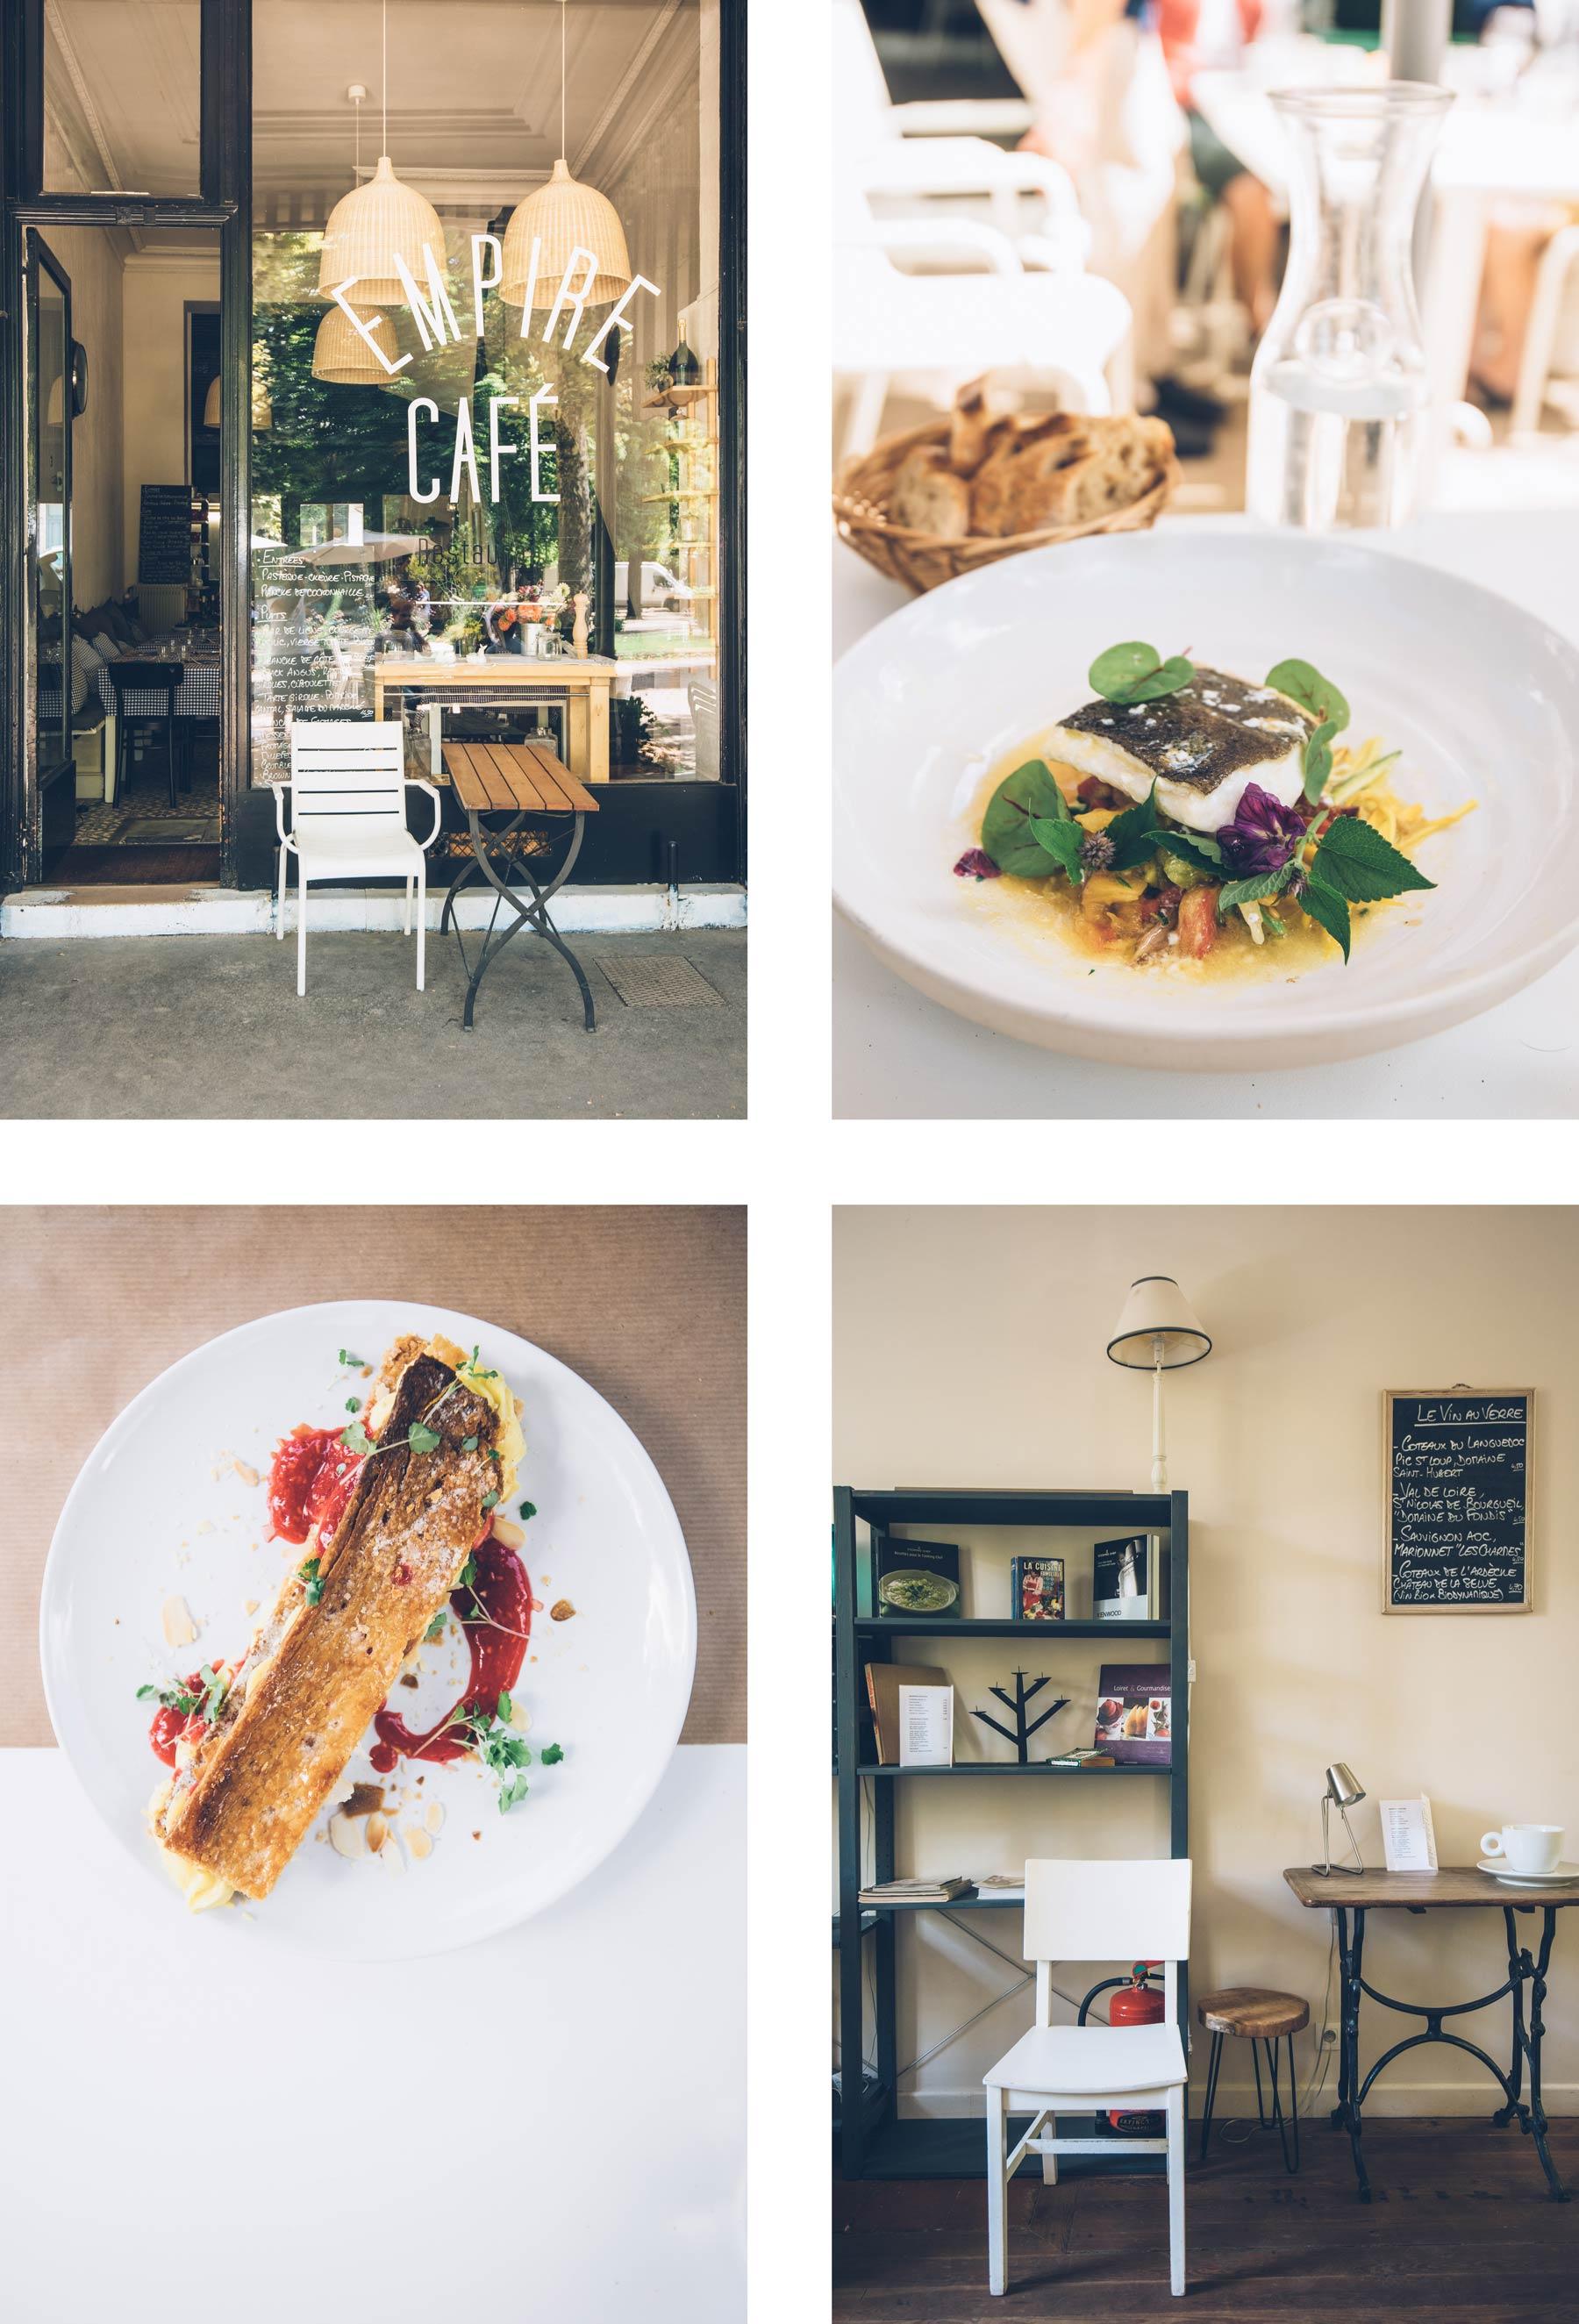 Bonne Adresse Resto à Vichy: L'Empire Cafe